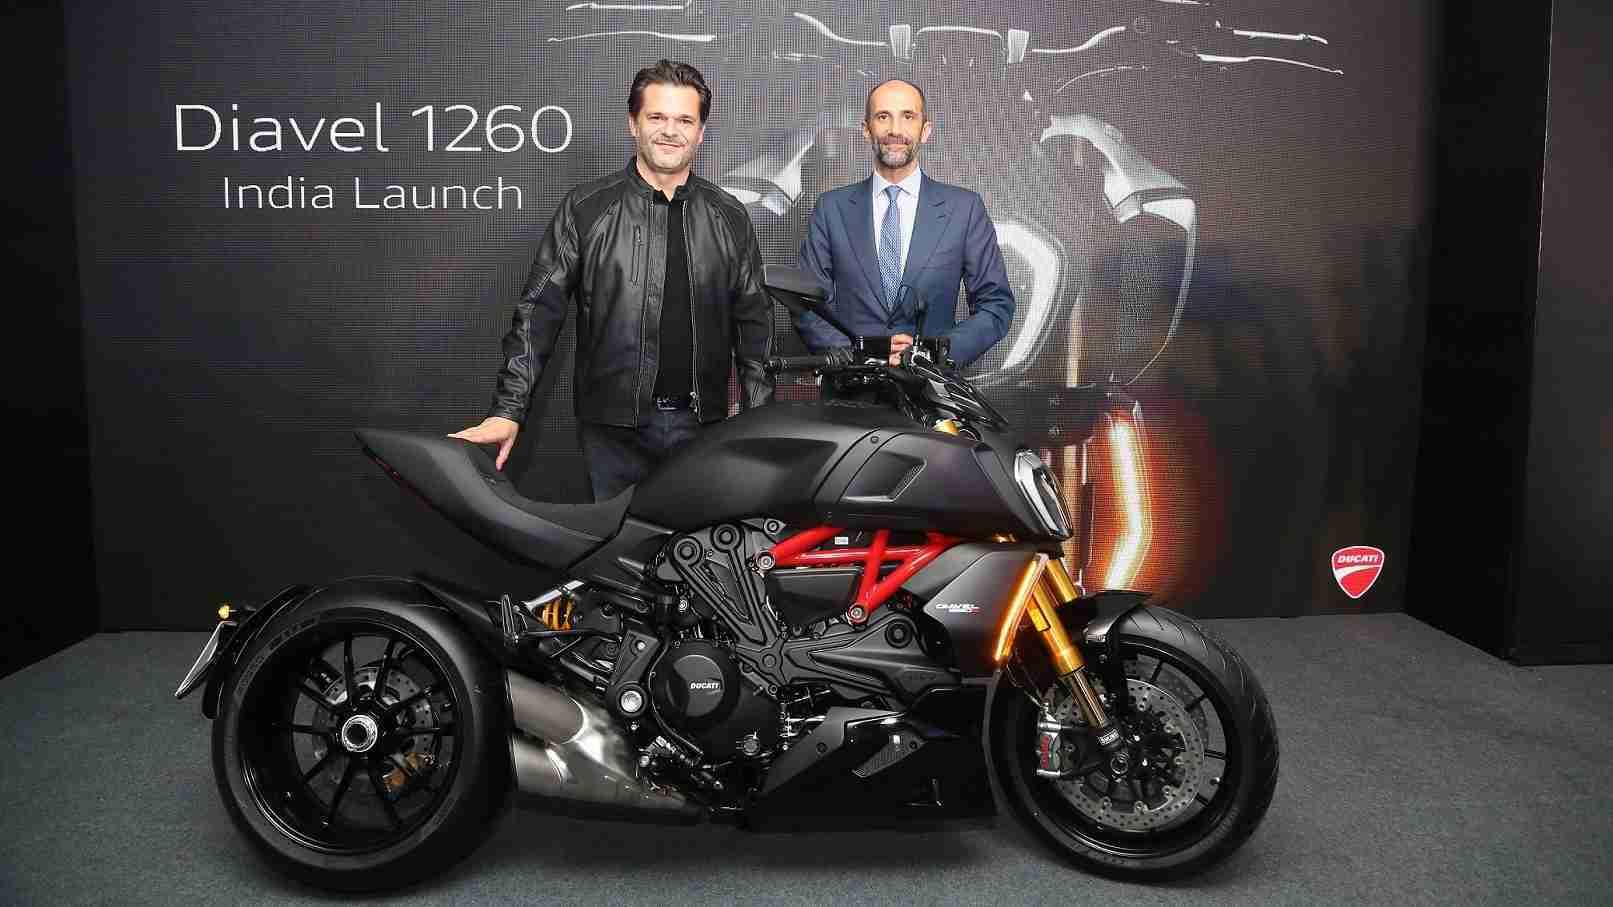 Sergi Canovas and Pietro Sferra Carini Ducati Diavel 1260 launch